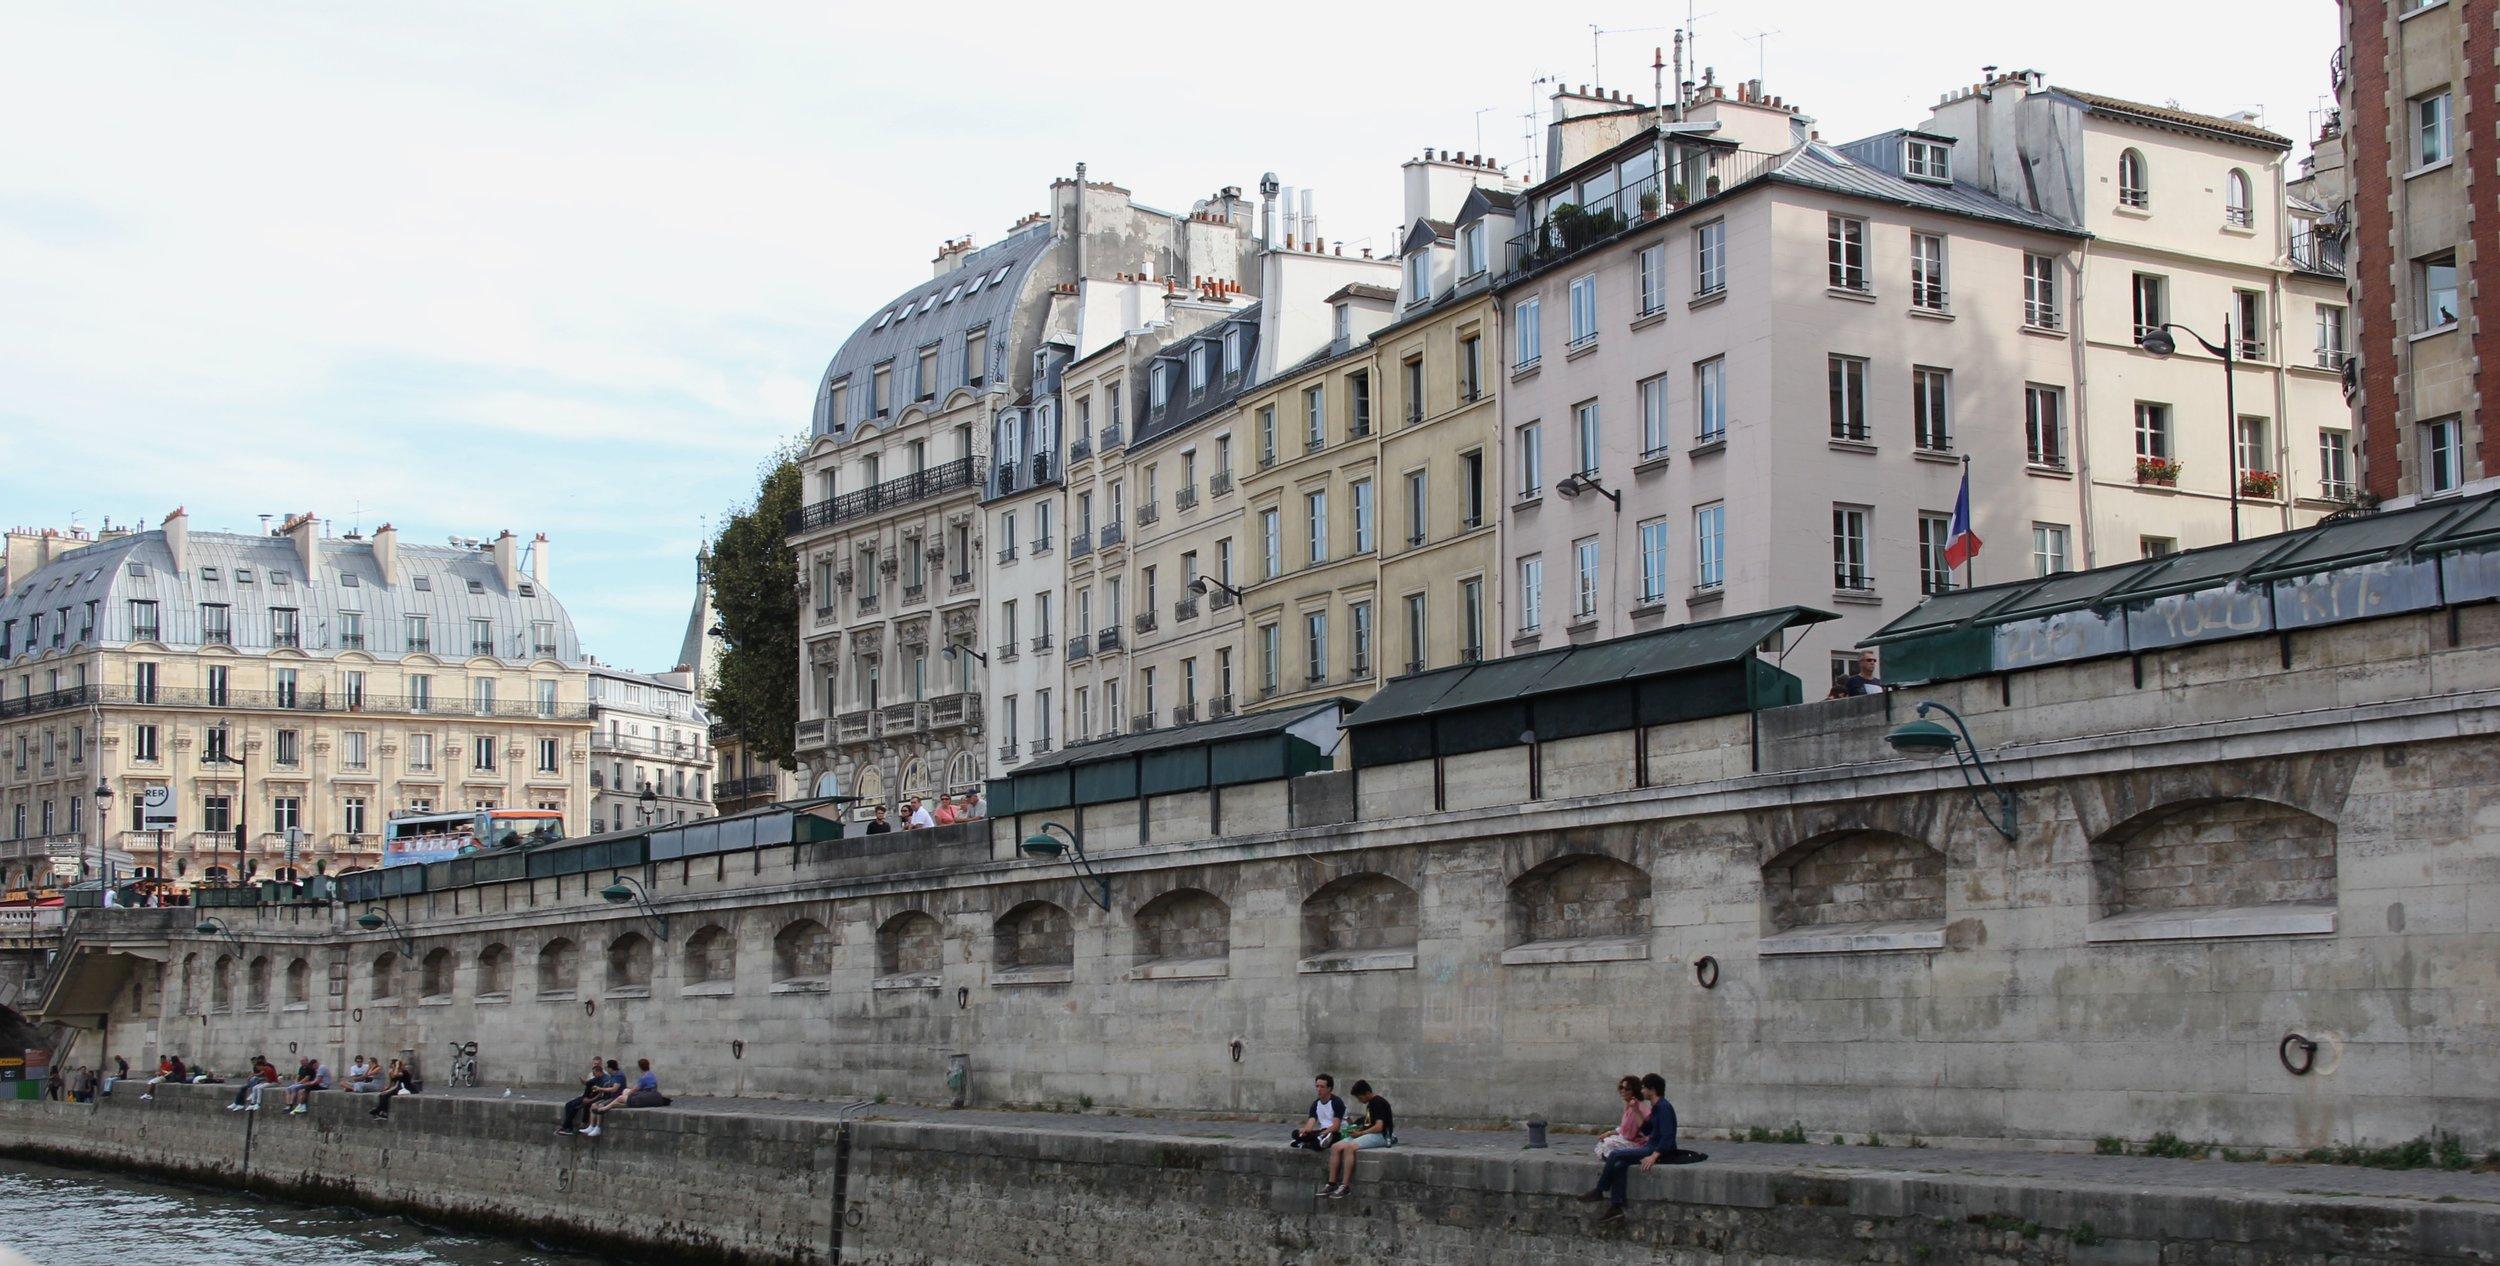 2016.09 Paris Edited 8252.jpg